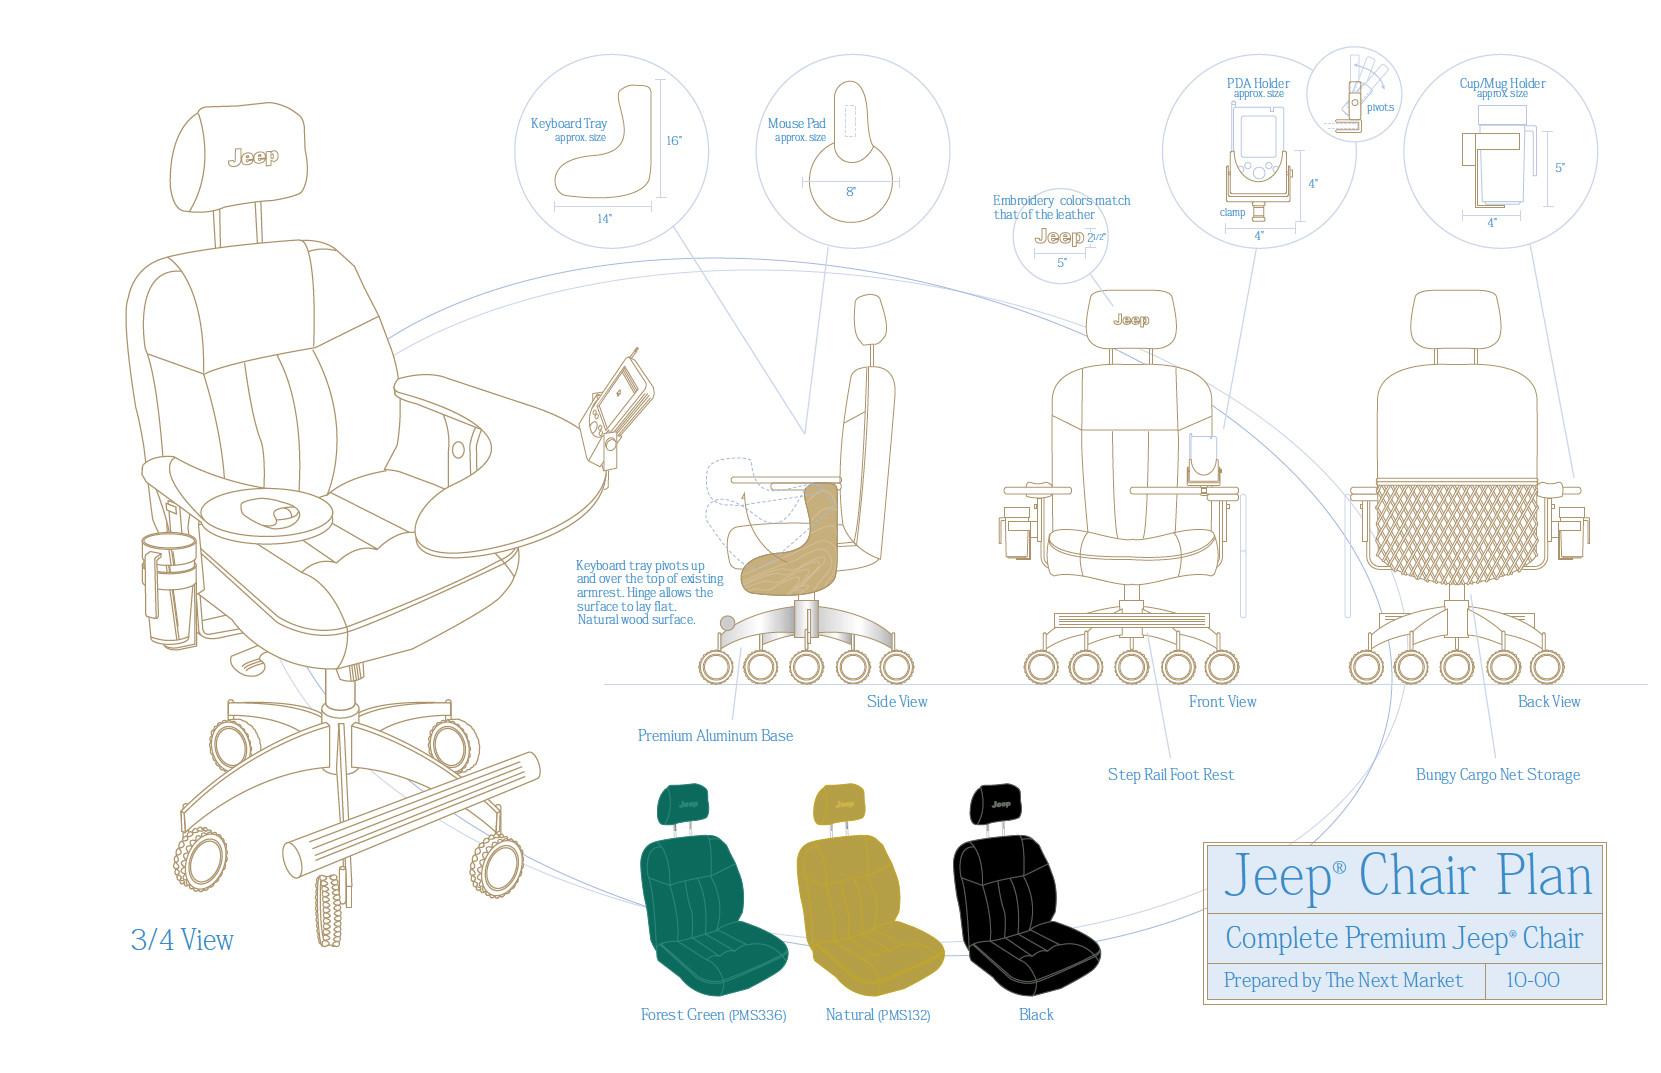 Patrick hatfield jeep chair 3